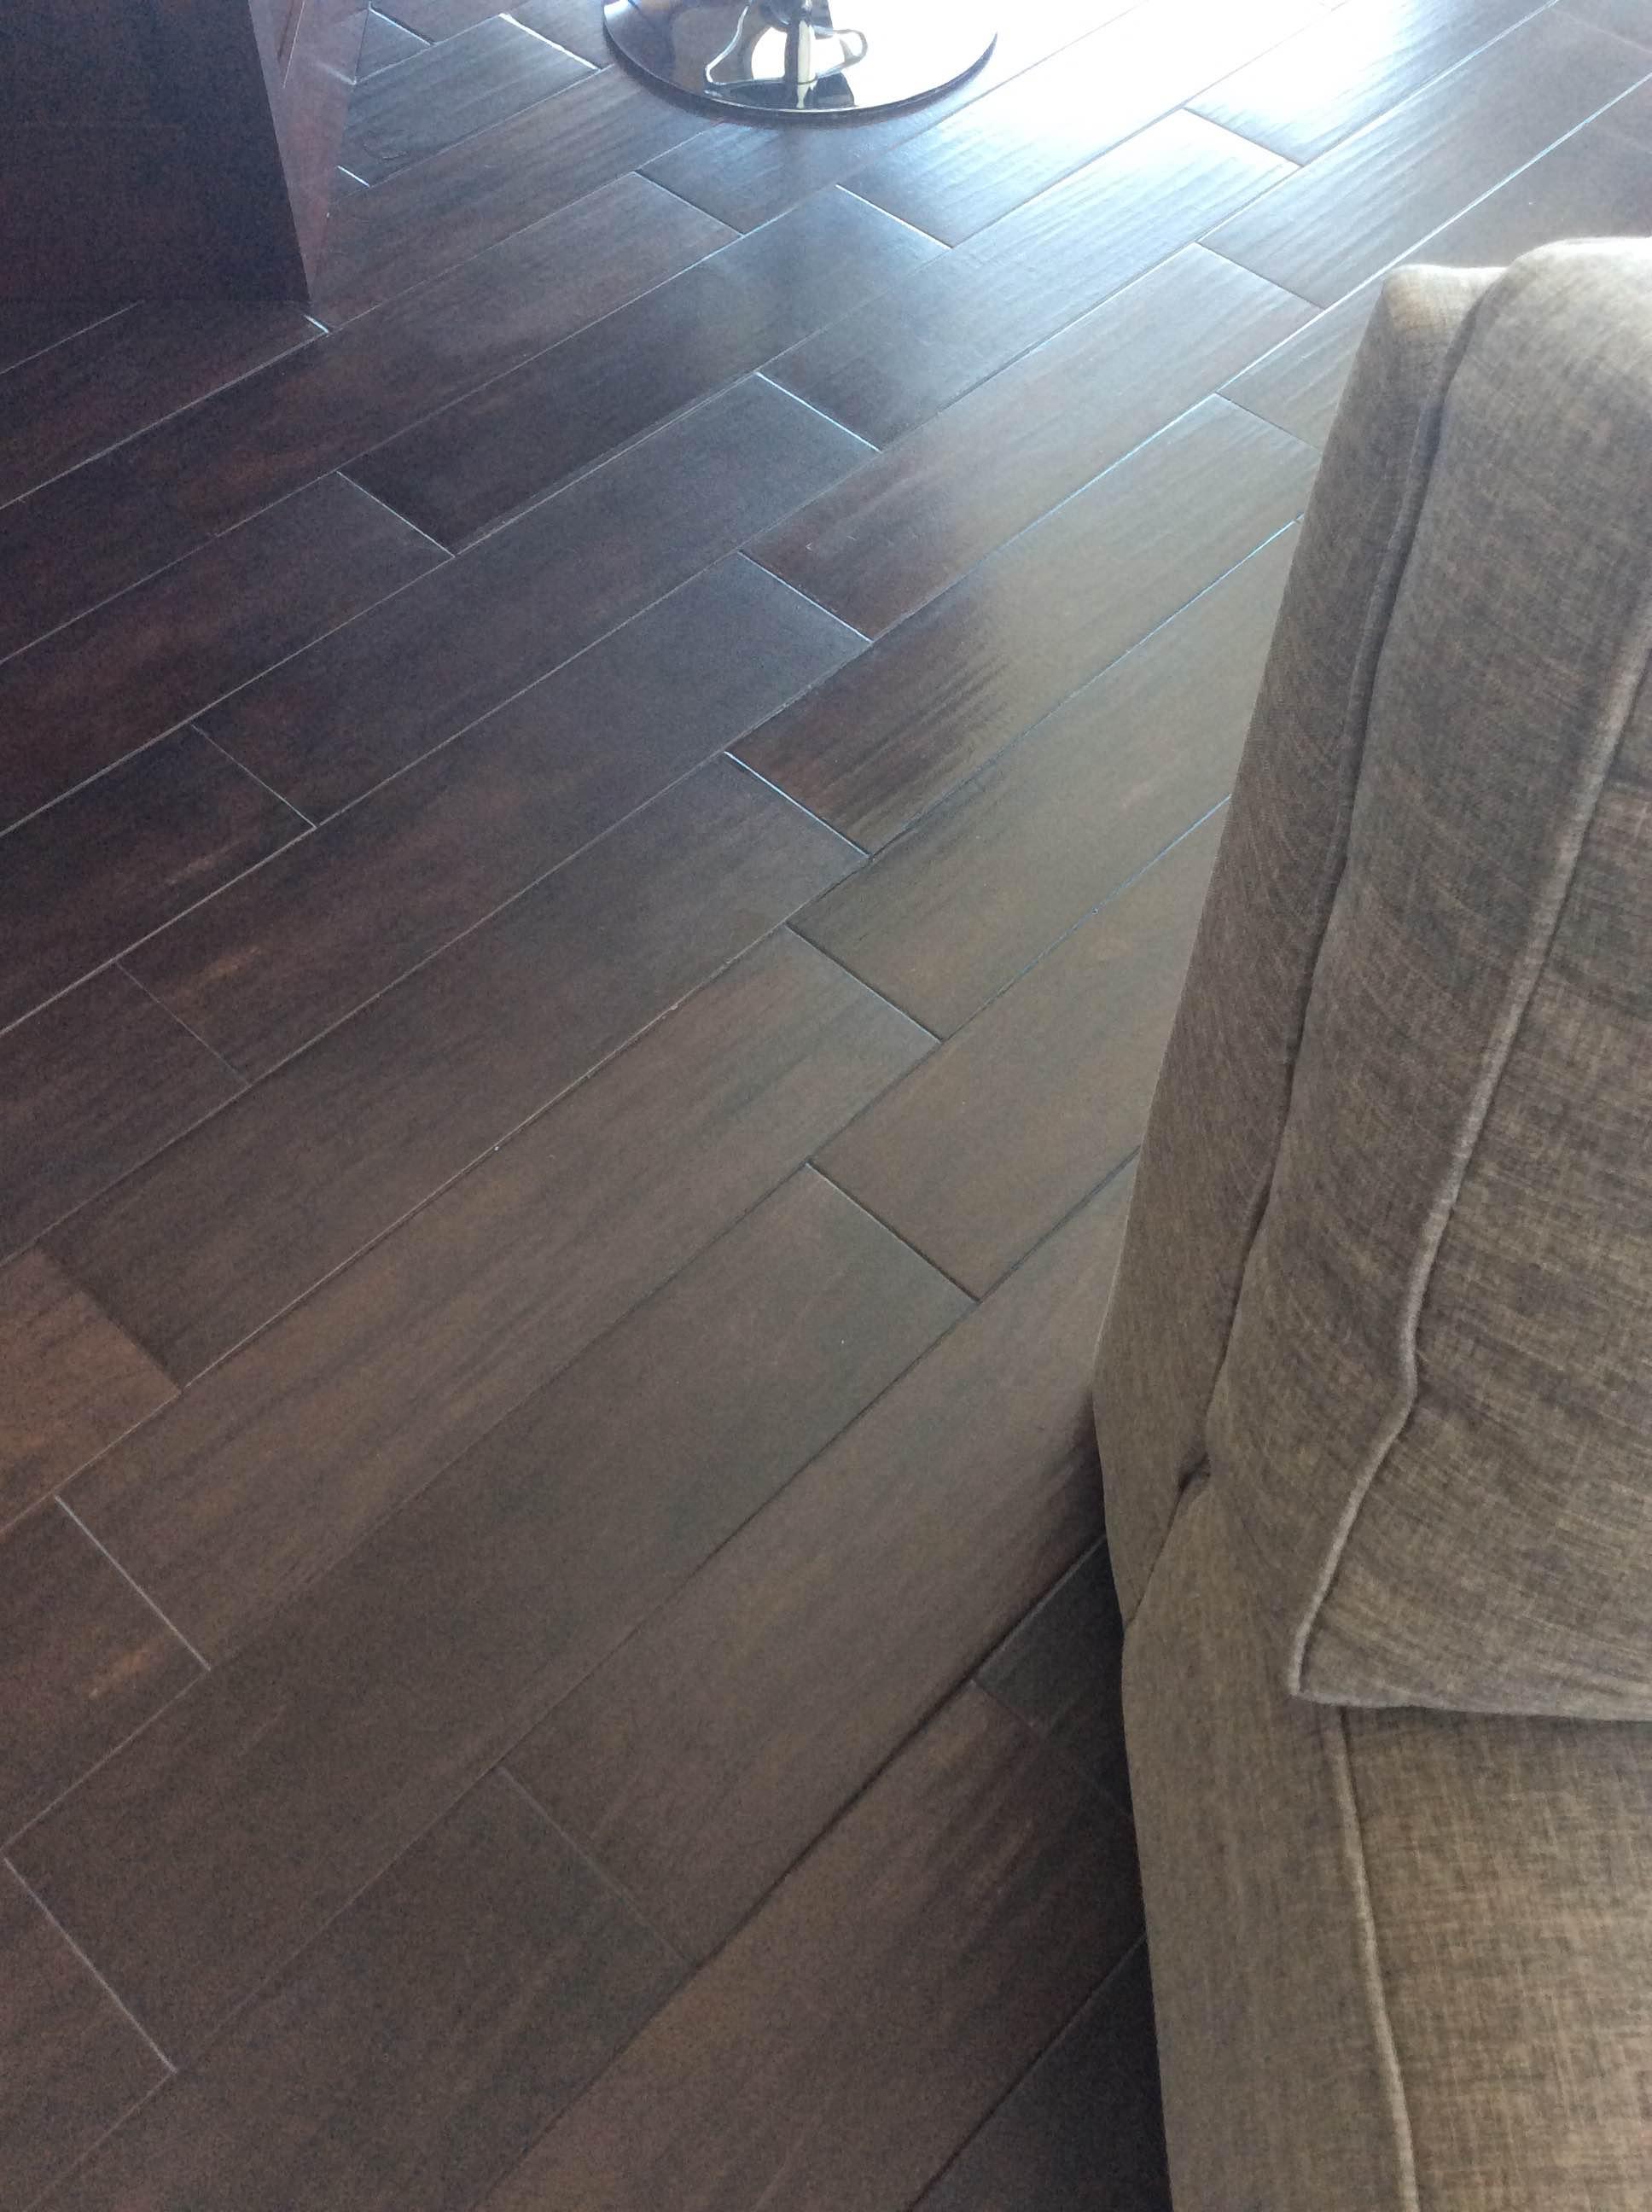 wetlook ceramic tile sealer covertec